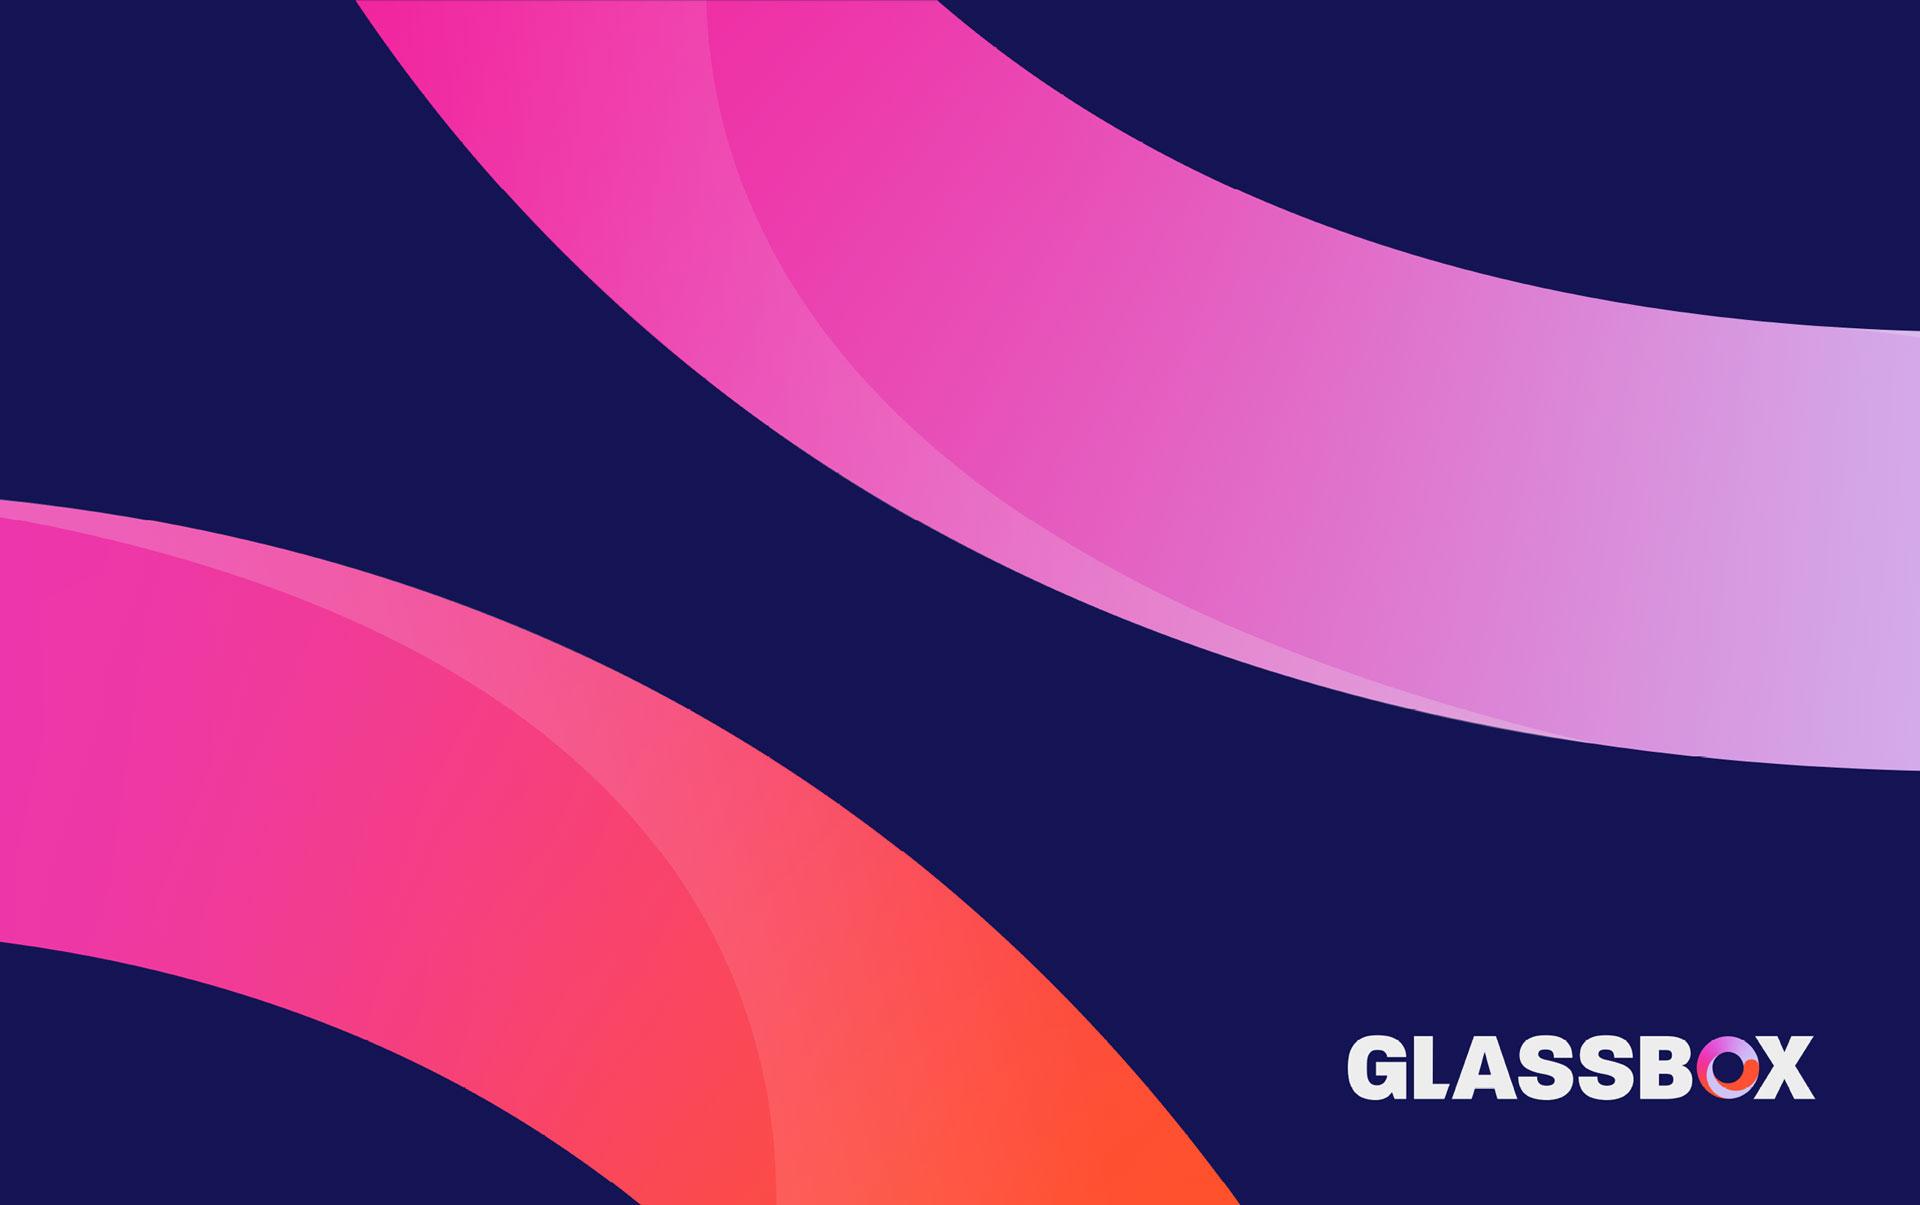 glassbox the journey layout